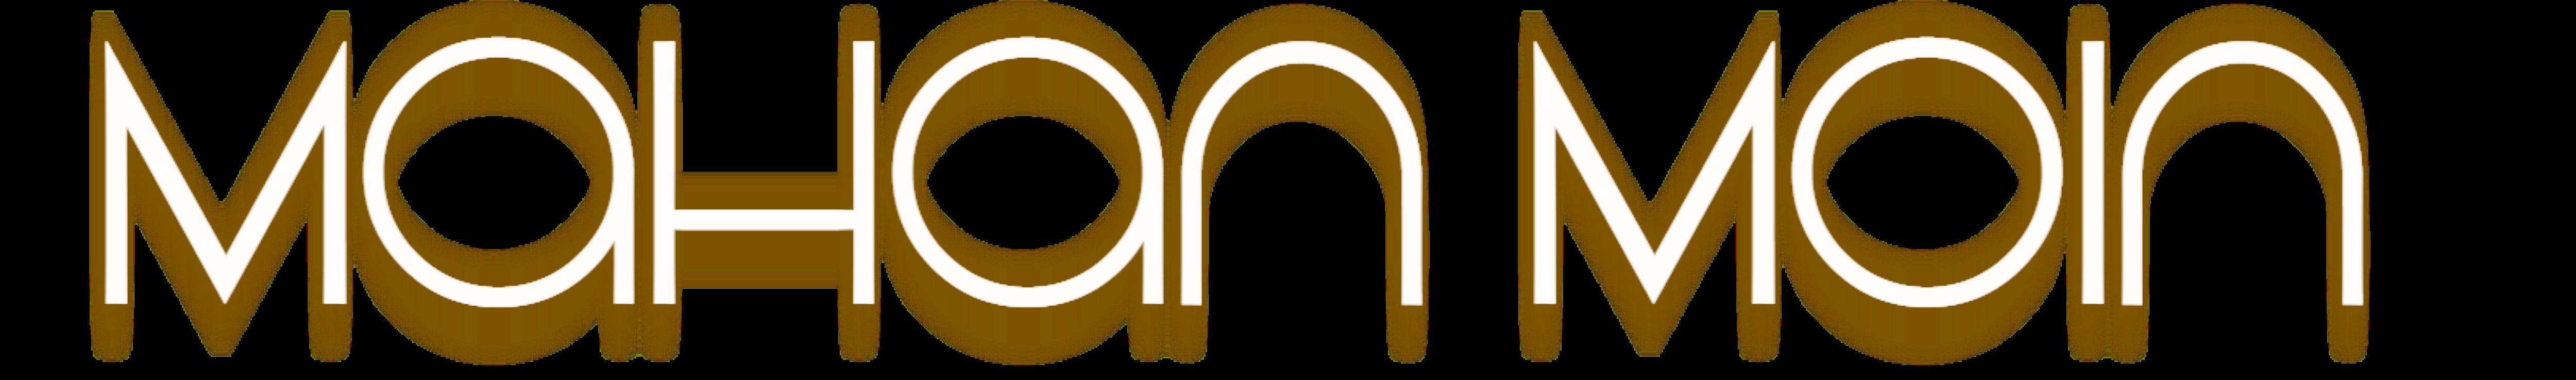 MahanMoin.com